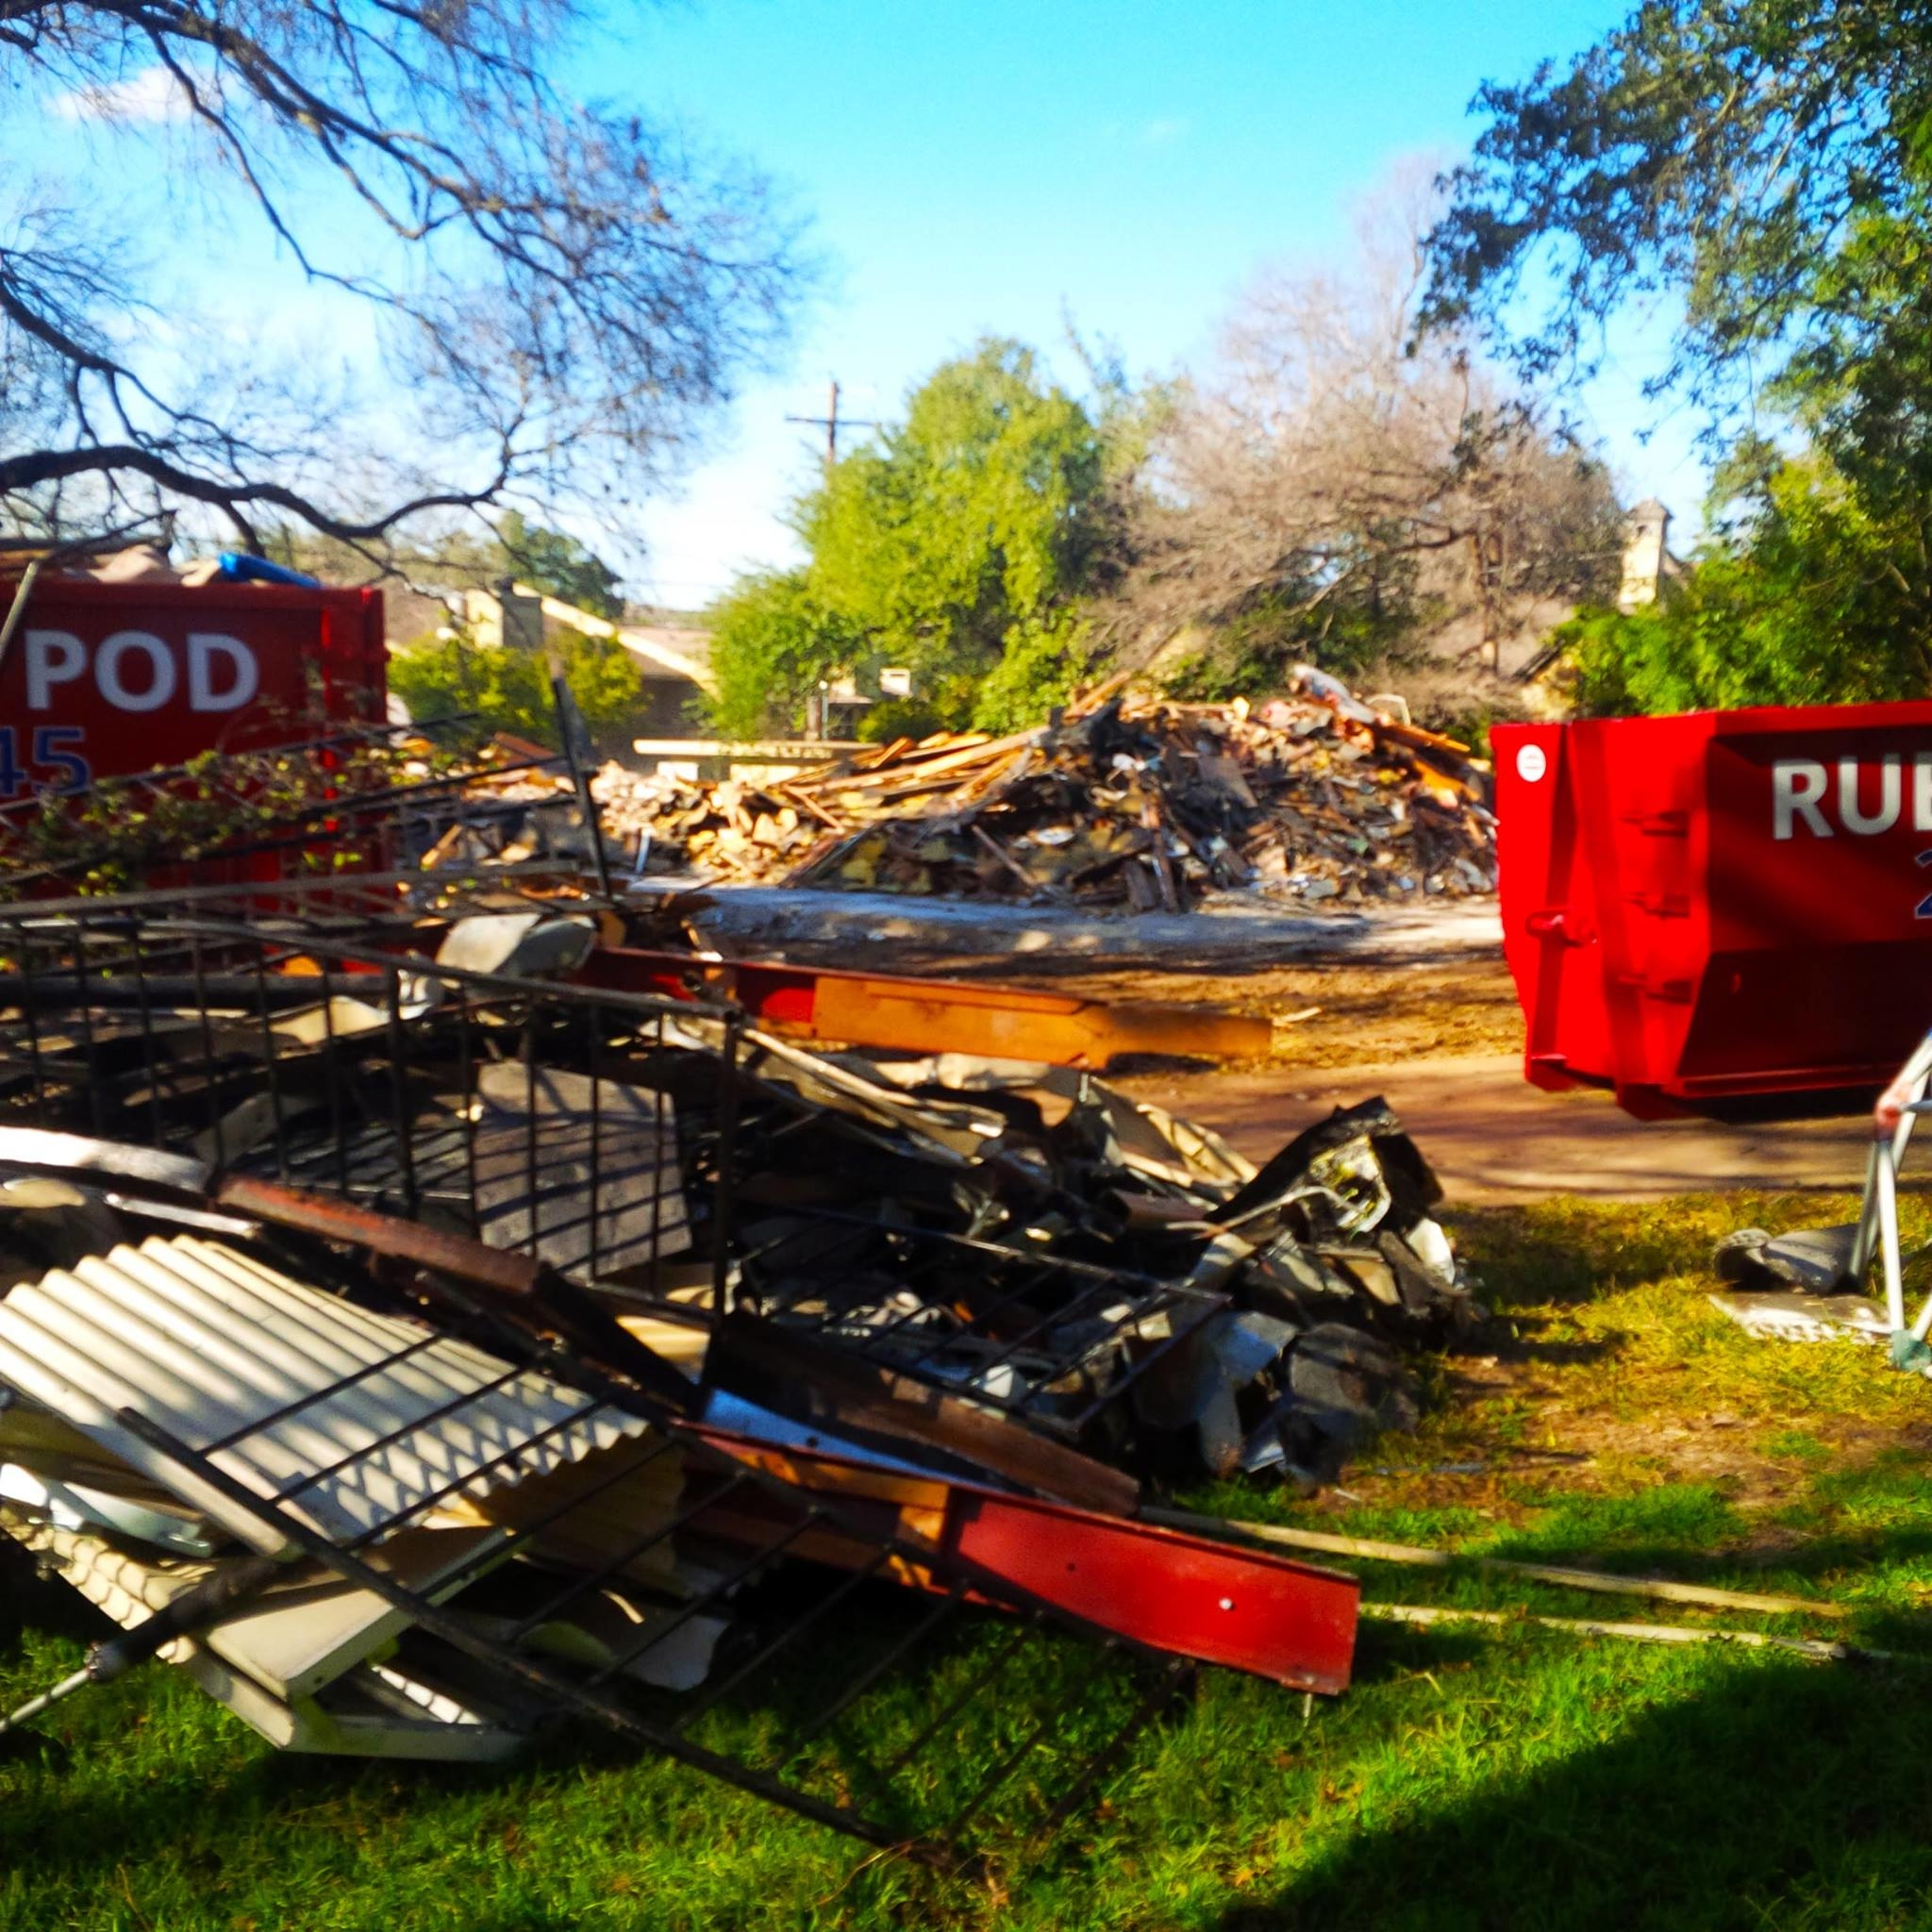 Rubbish Inc - West Austin image 4